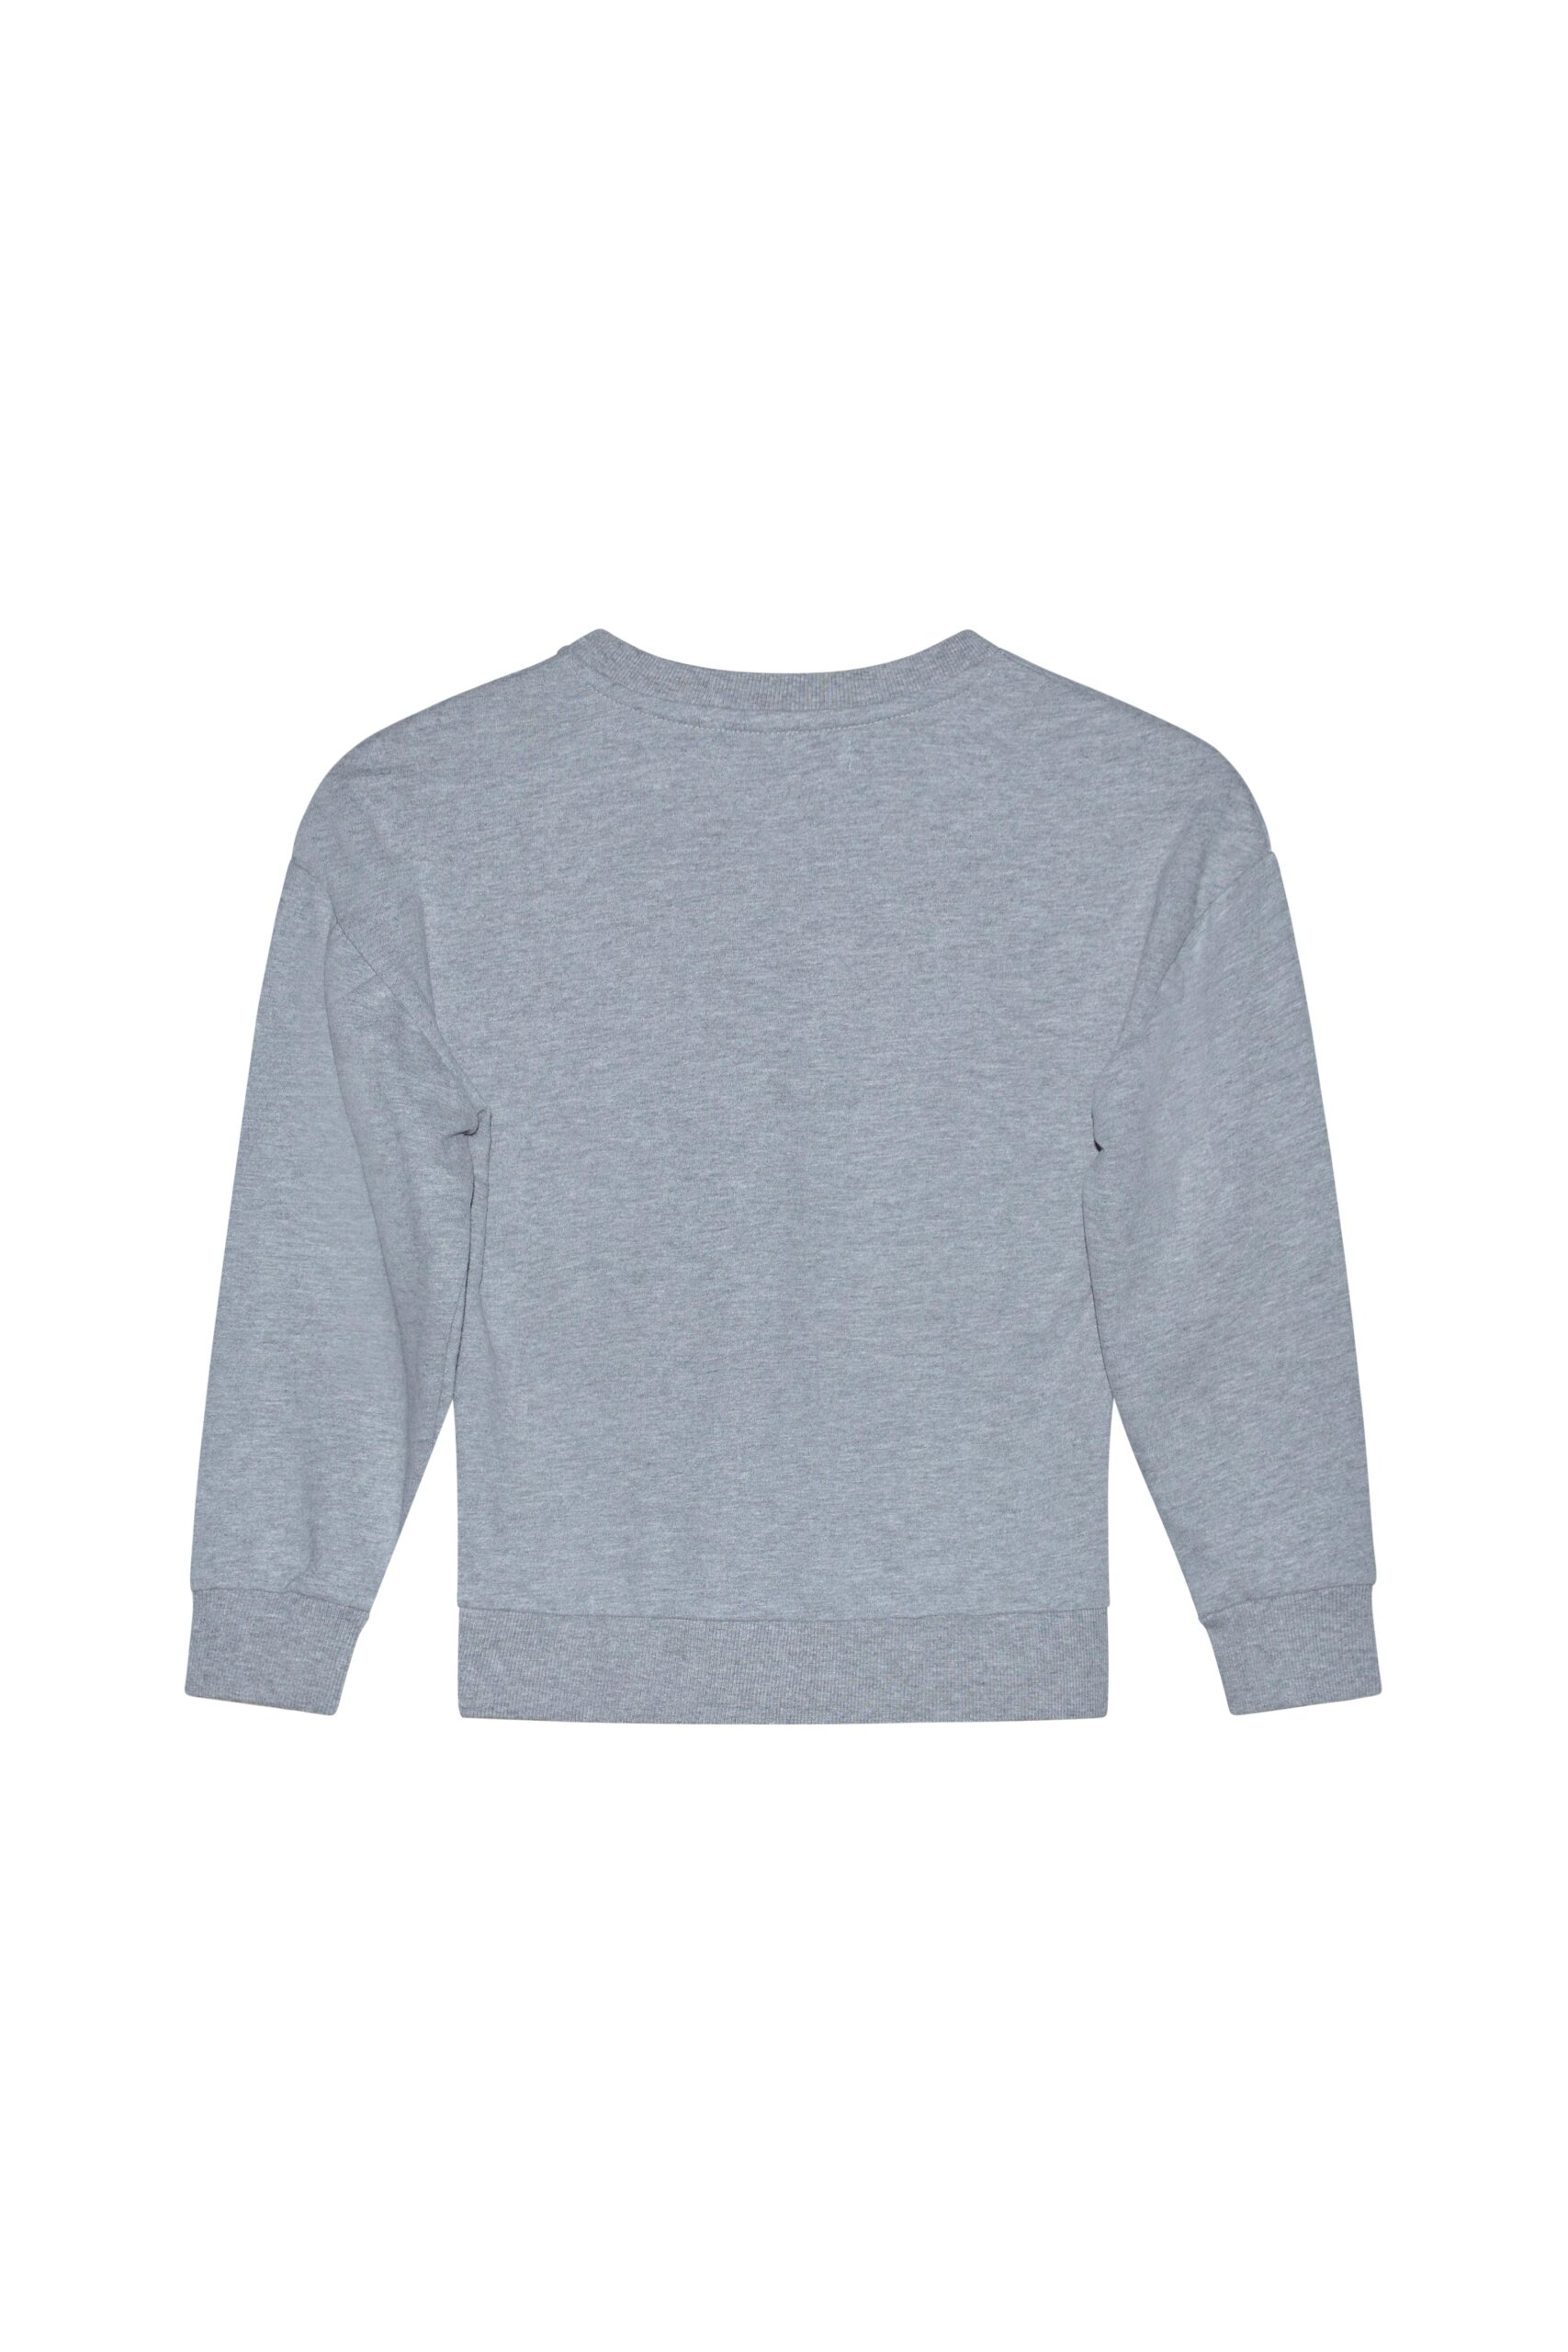 Wilder sweater organic